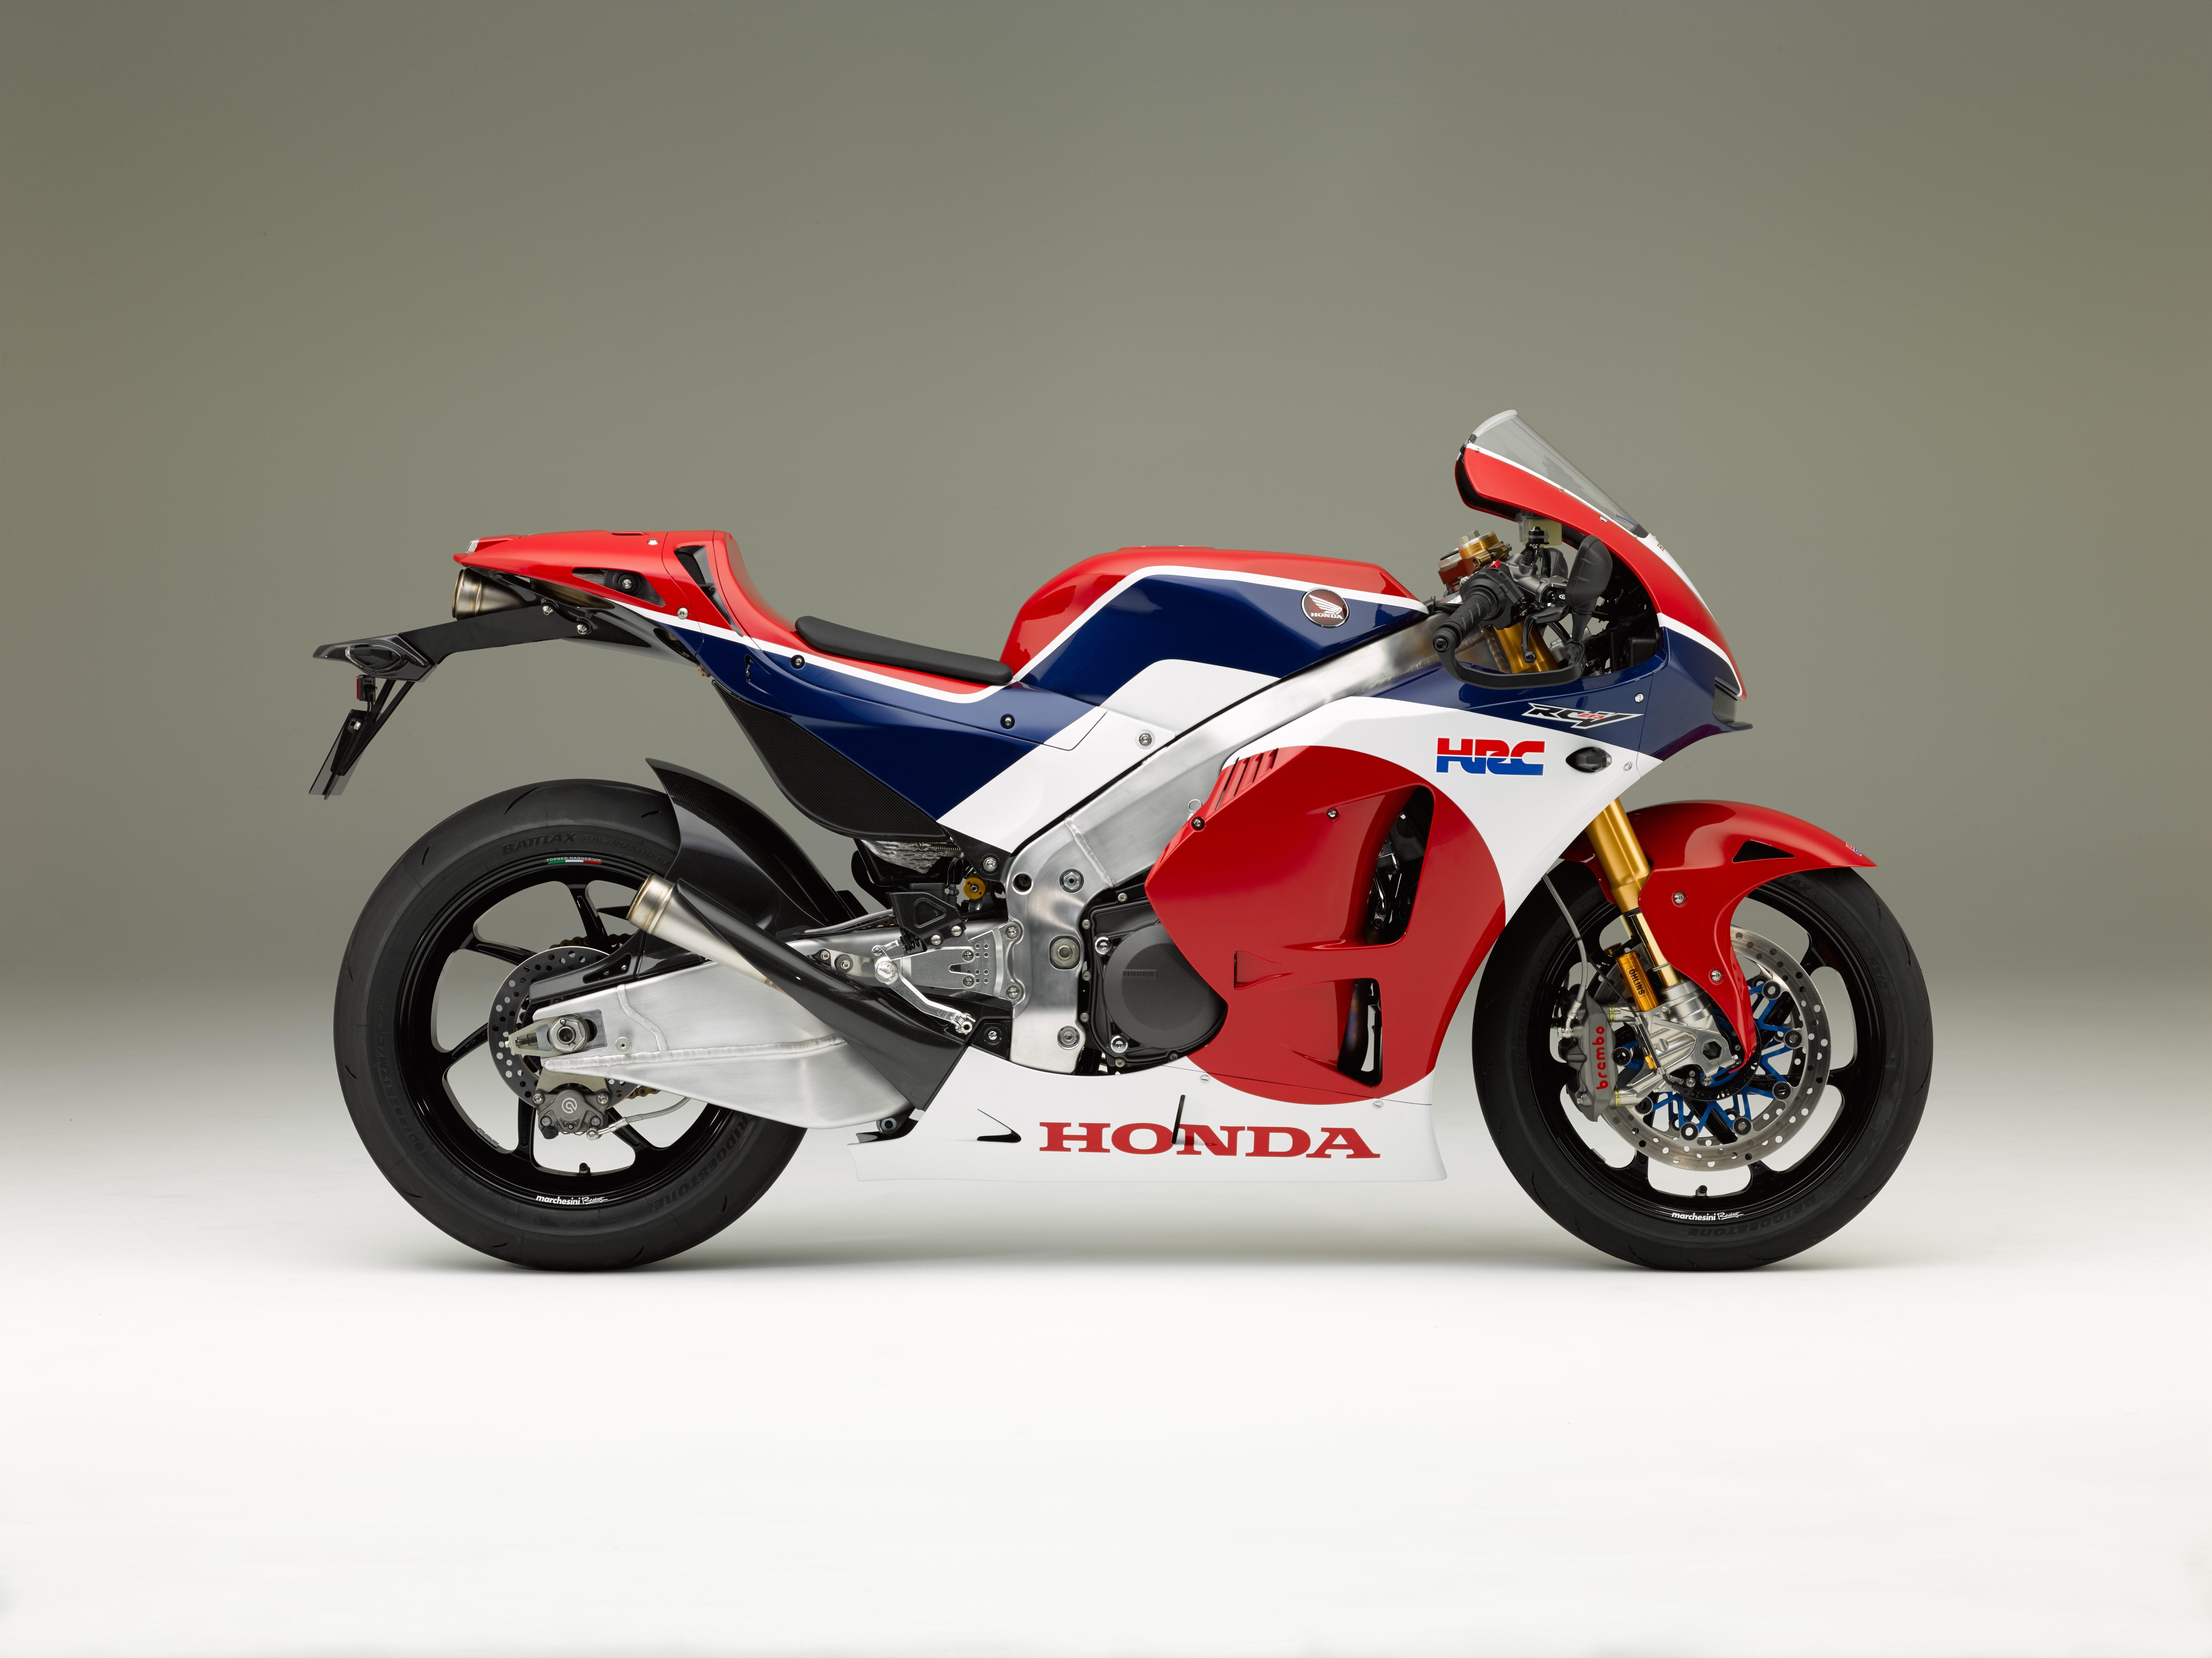 Honda RC213V S MotoGP replica - YouTube